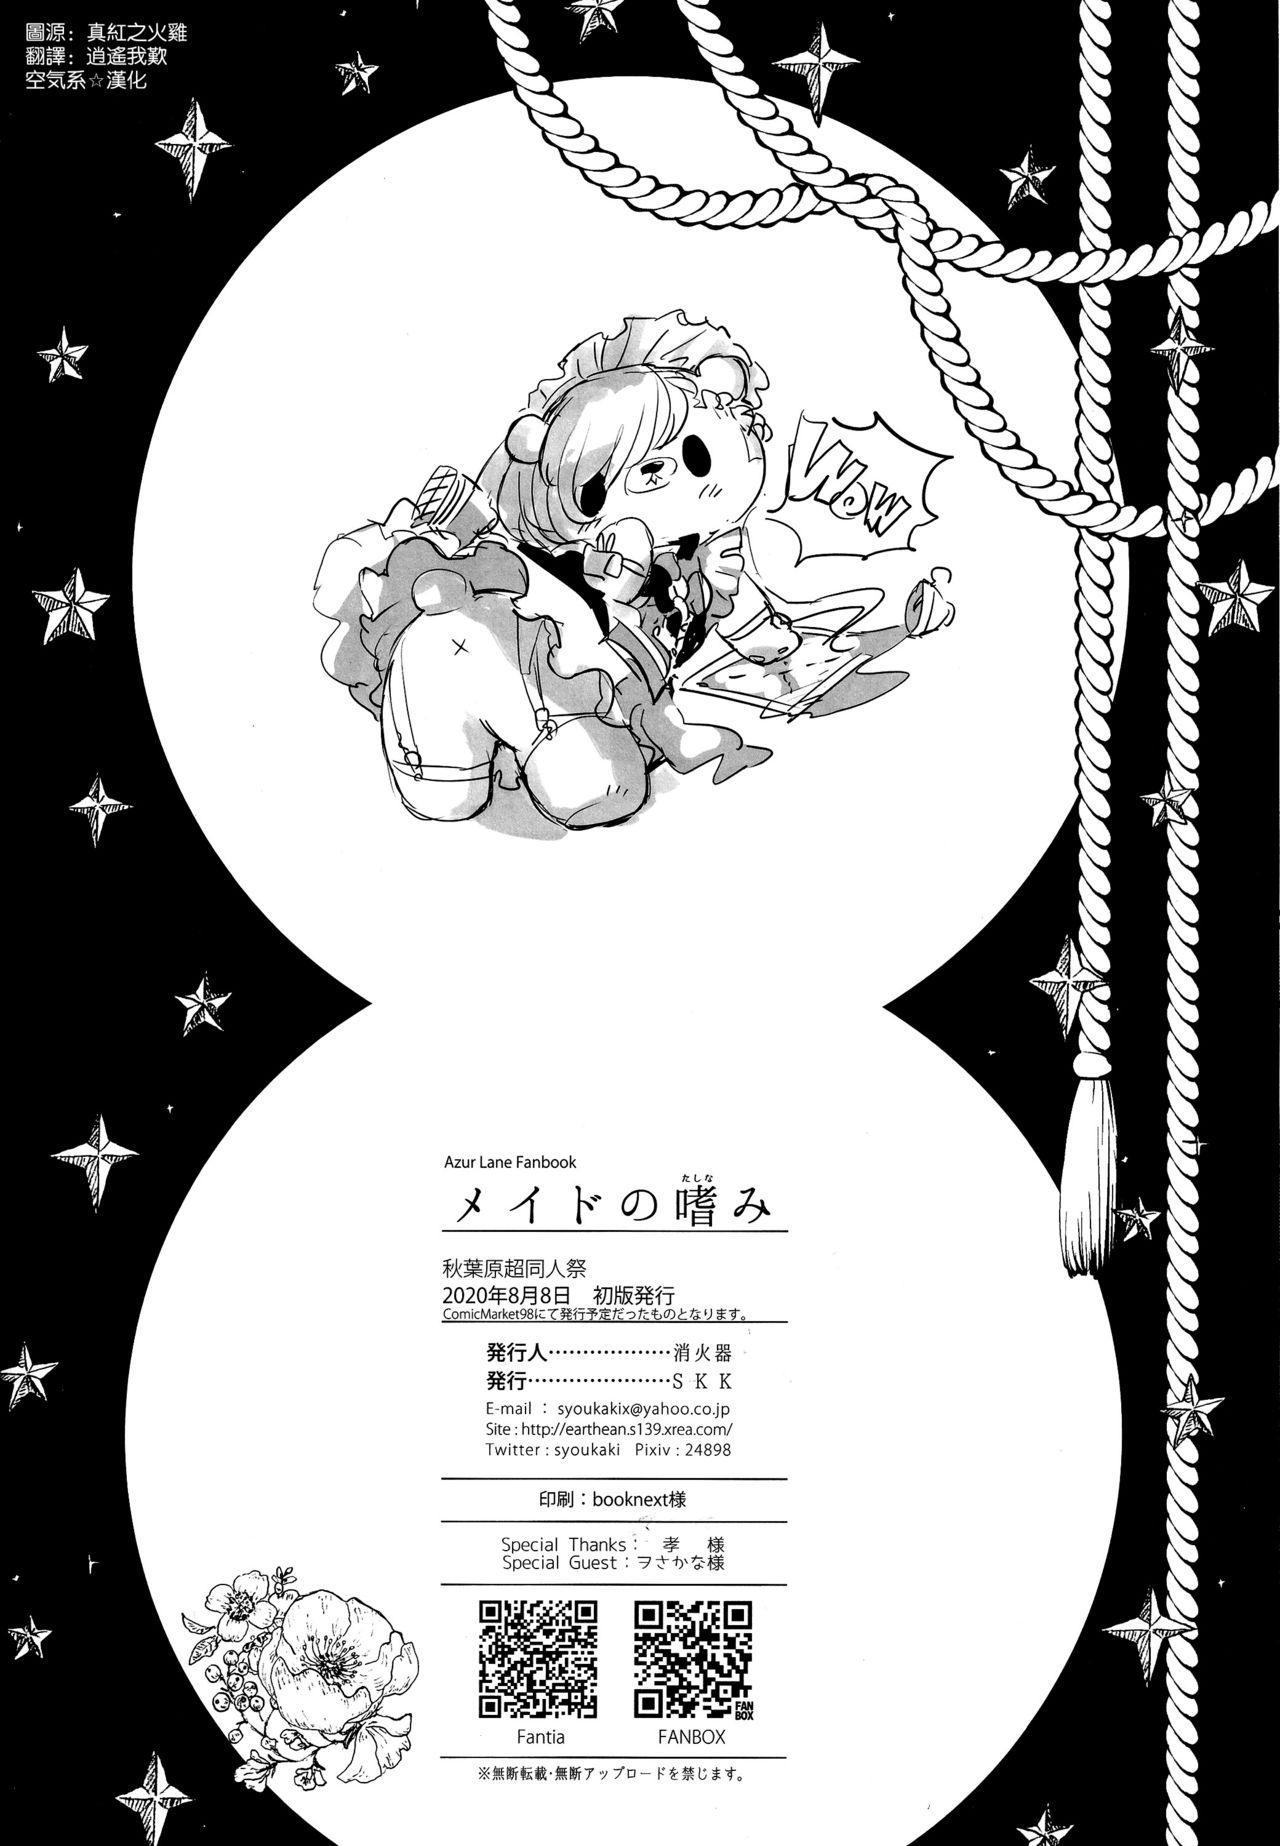 Maid no Tashinami - Discretion of the maid 25